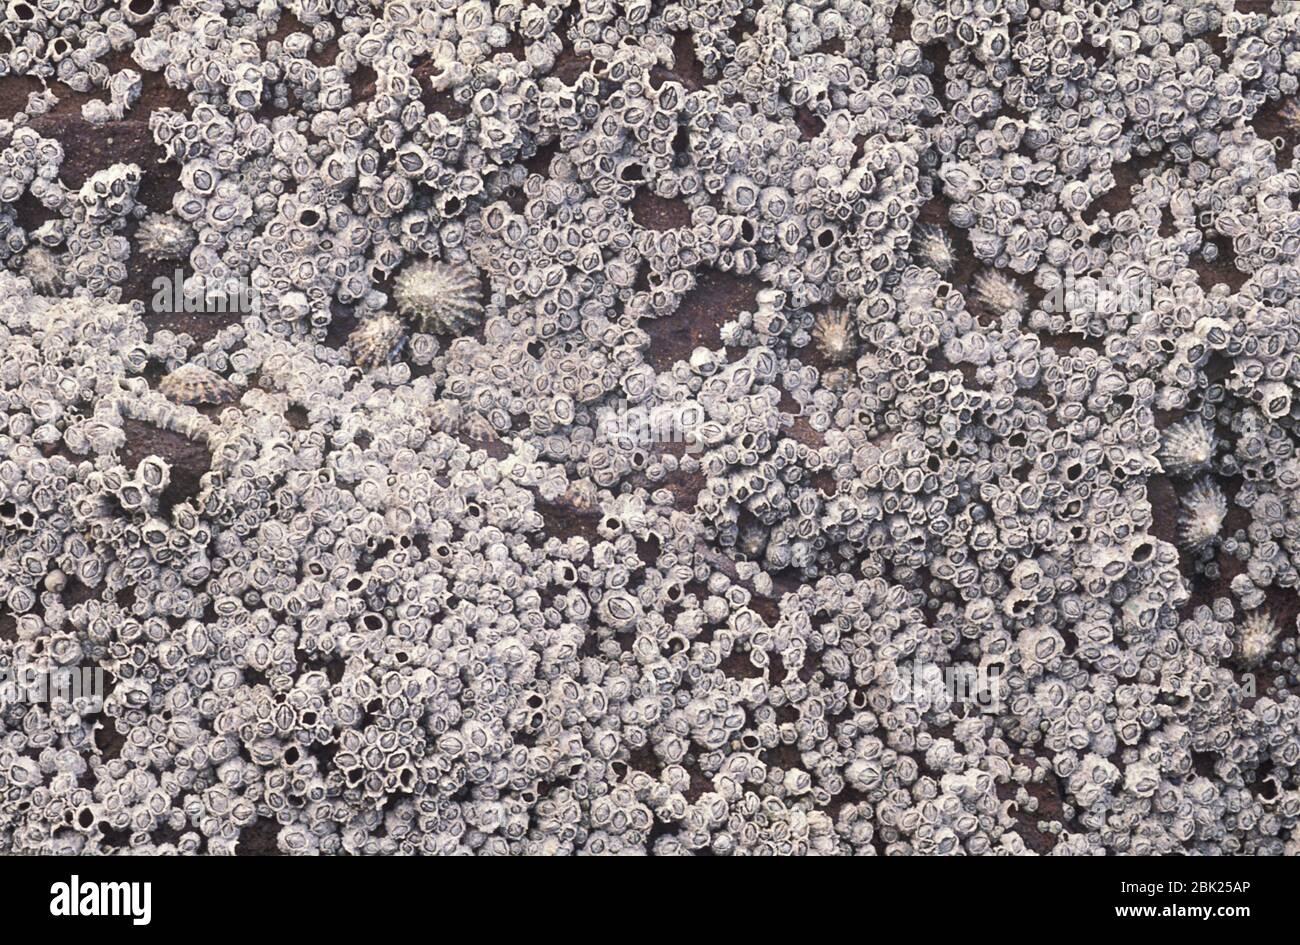 Barnacles de Acorn, Balanoides de Semibalanus, sobre rocas en la playa, Reino Unido Foto de stock